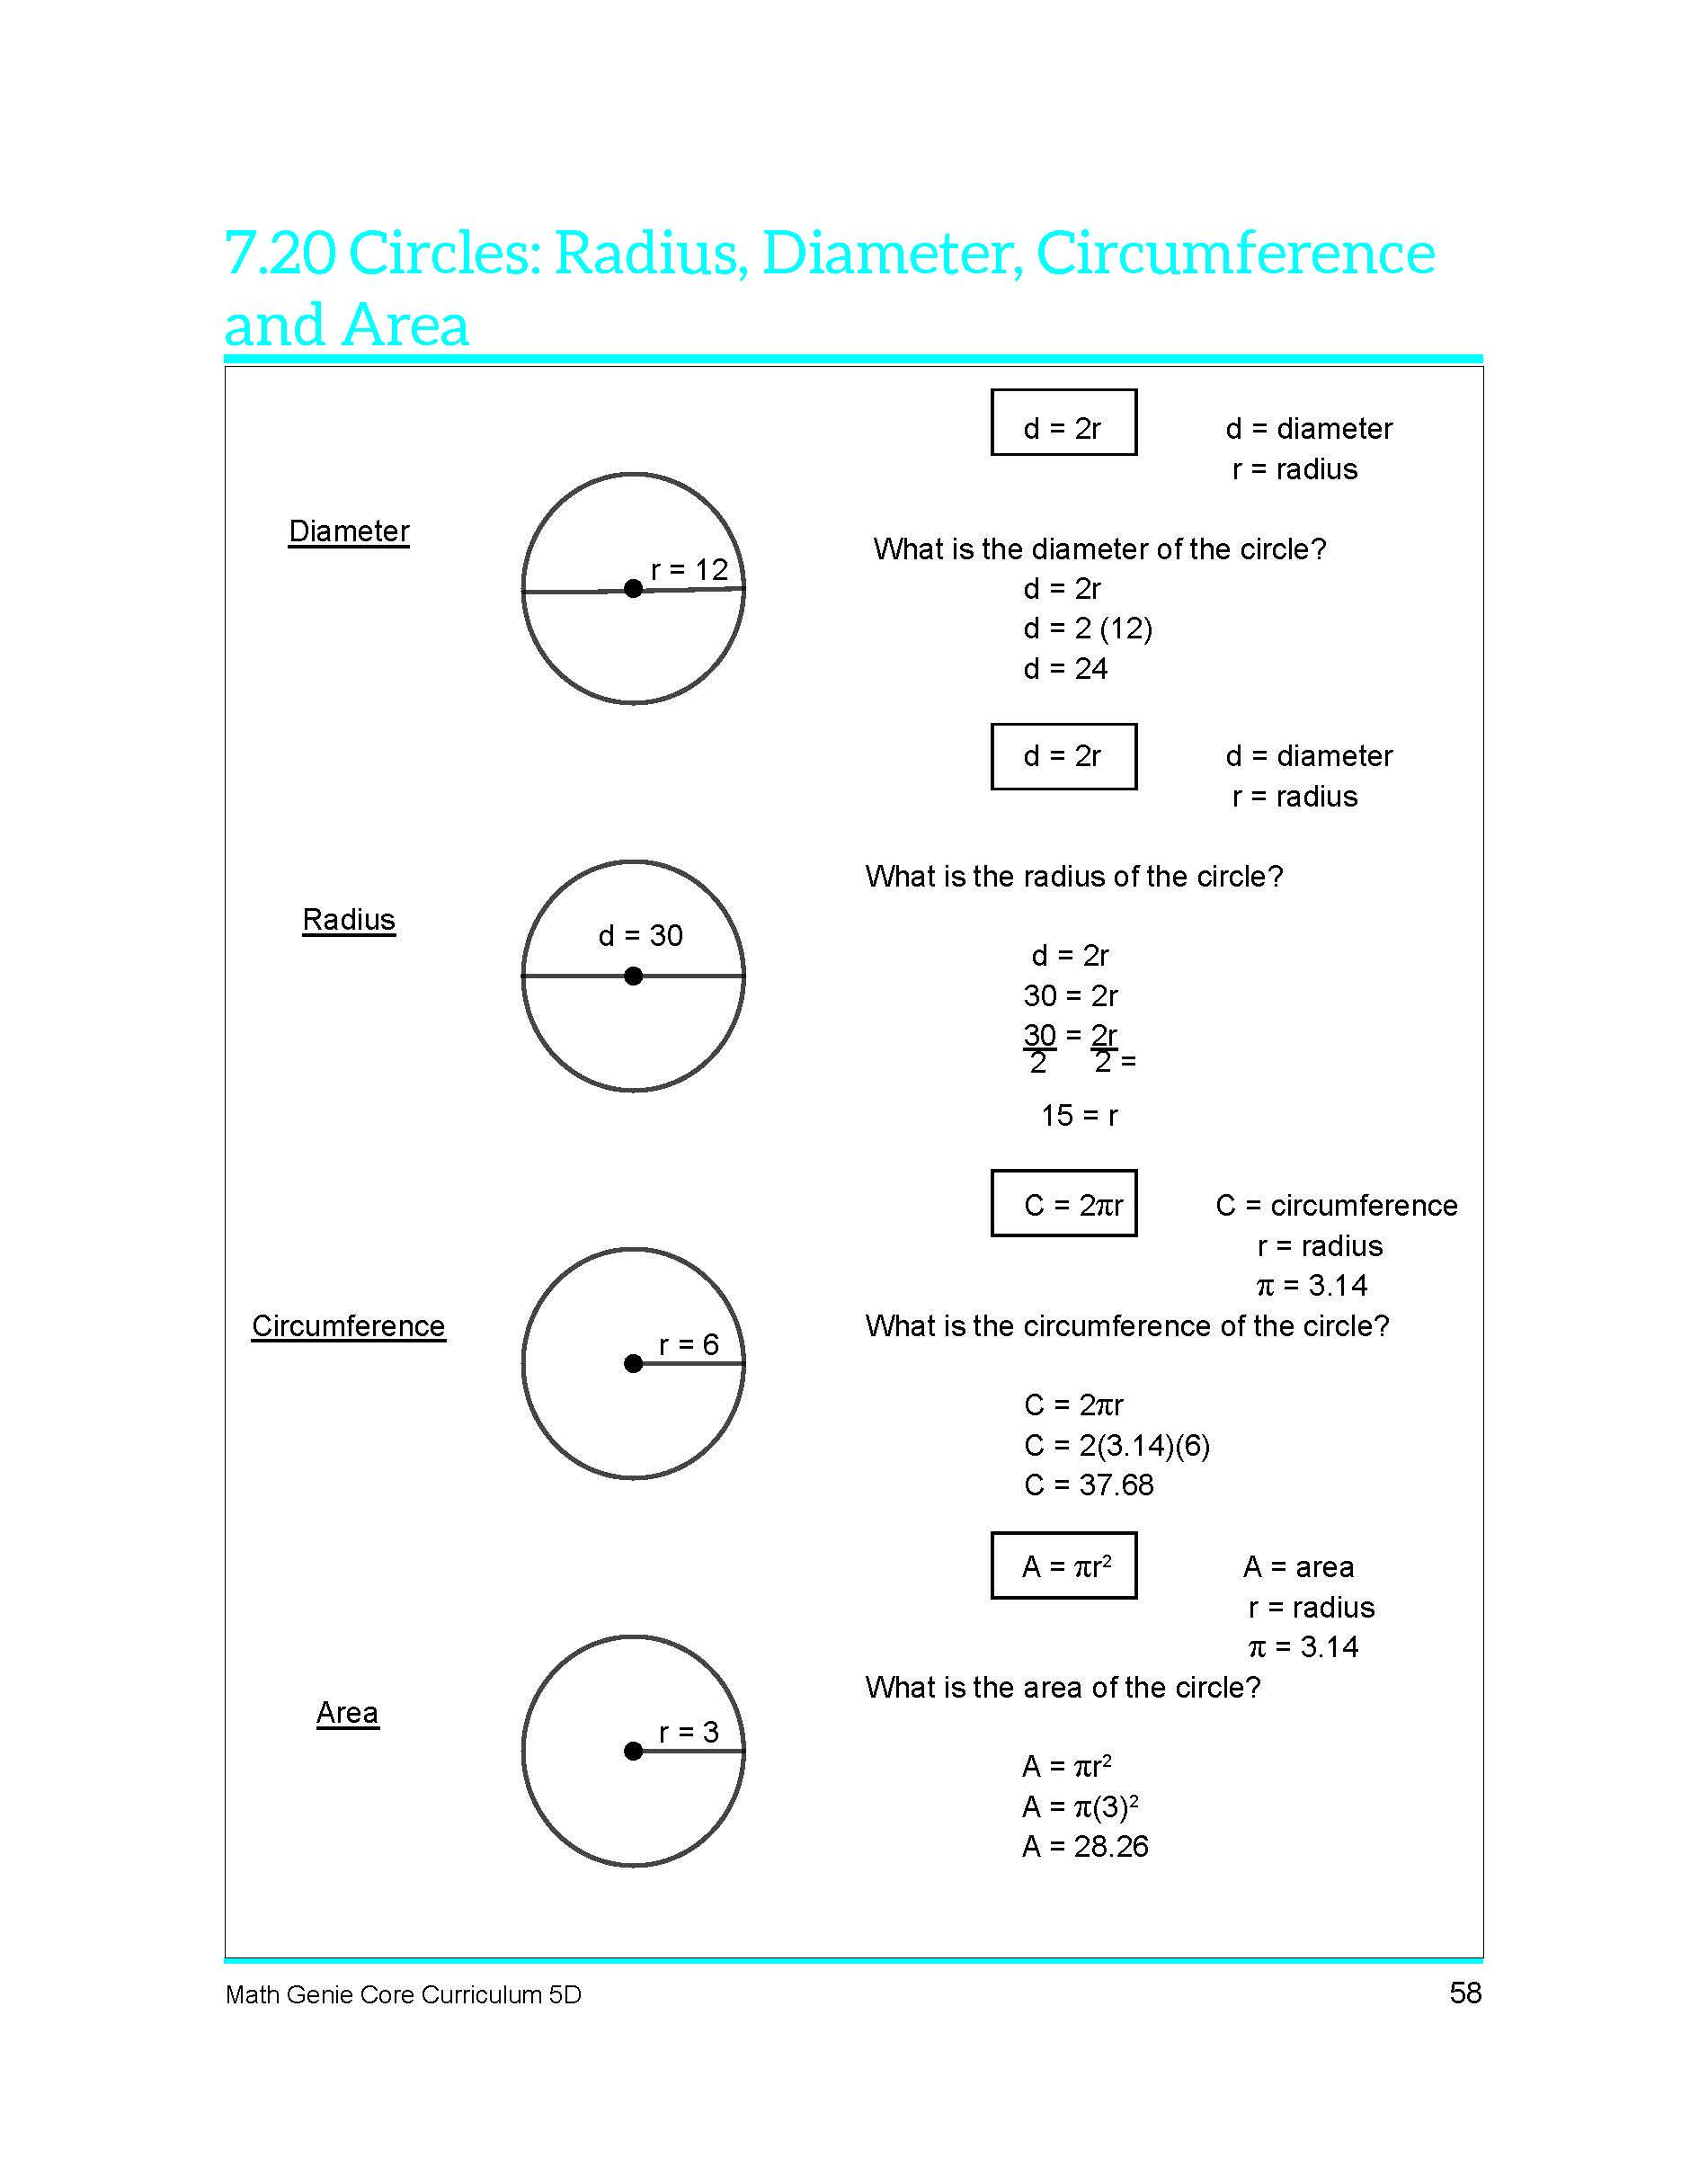 Grade-5-Circles-Radius-Diameter-Circumference-Area.jpg